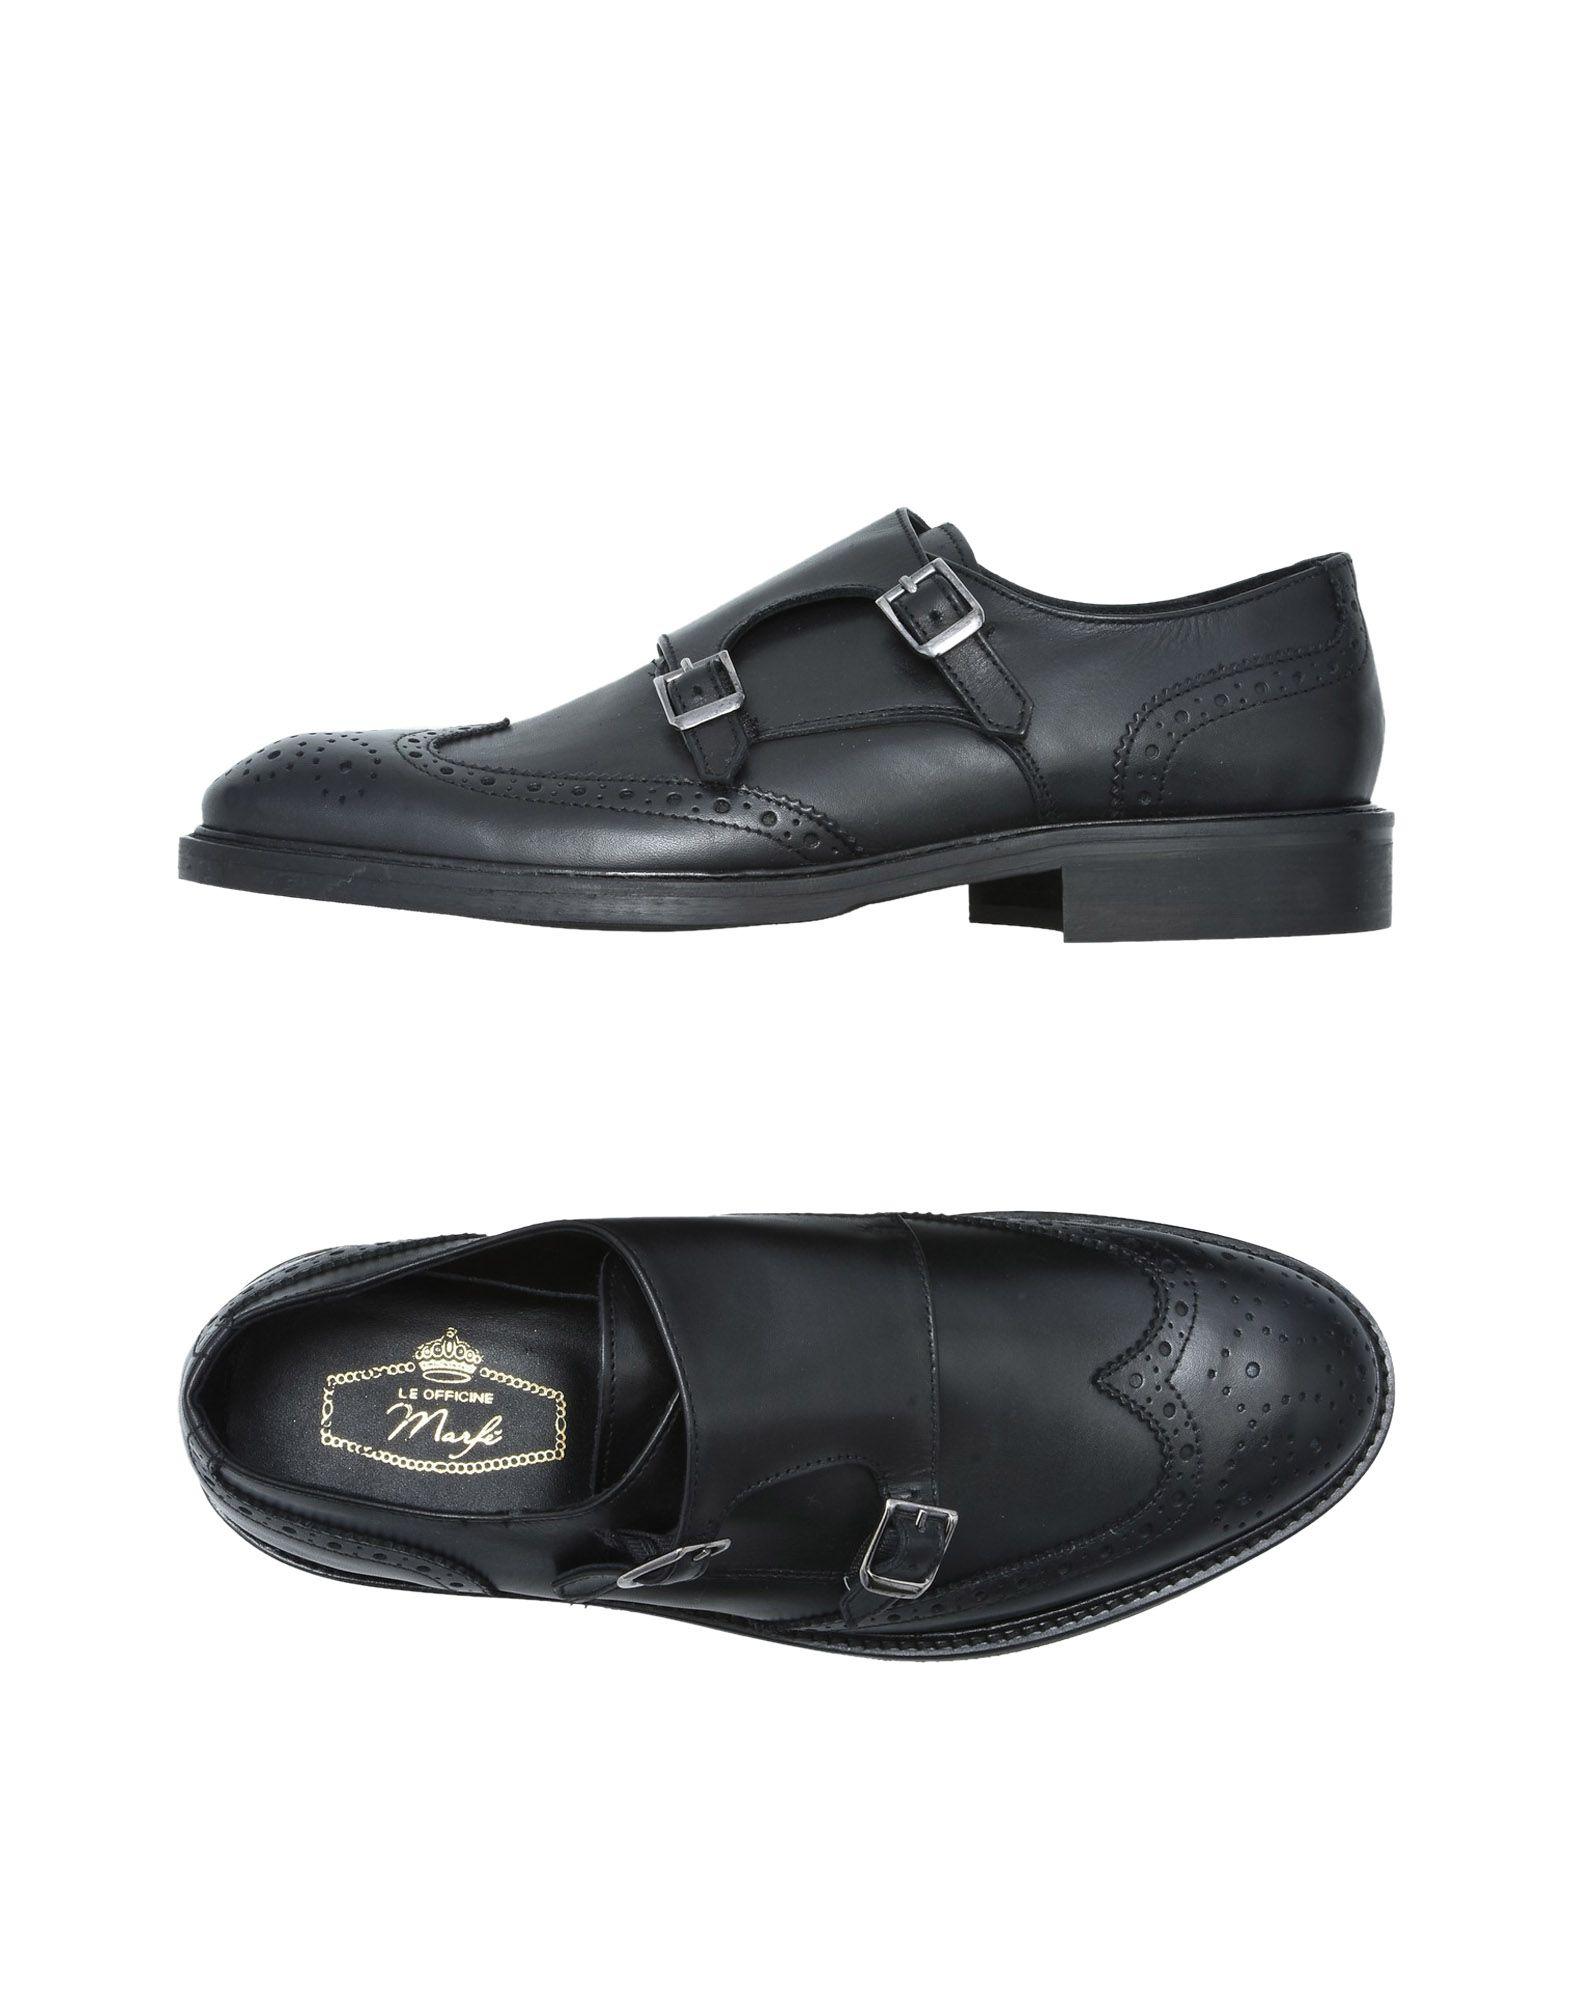 Rabatt echte Schuhe Le Officine Marfé Mokassins Herren  11508702BO